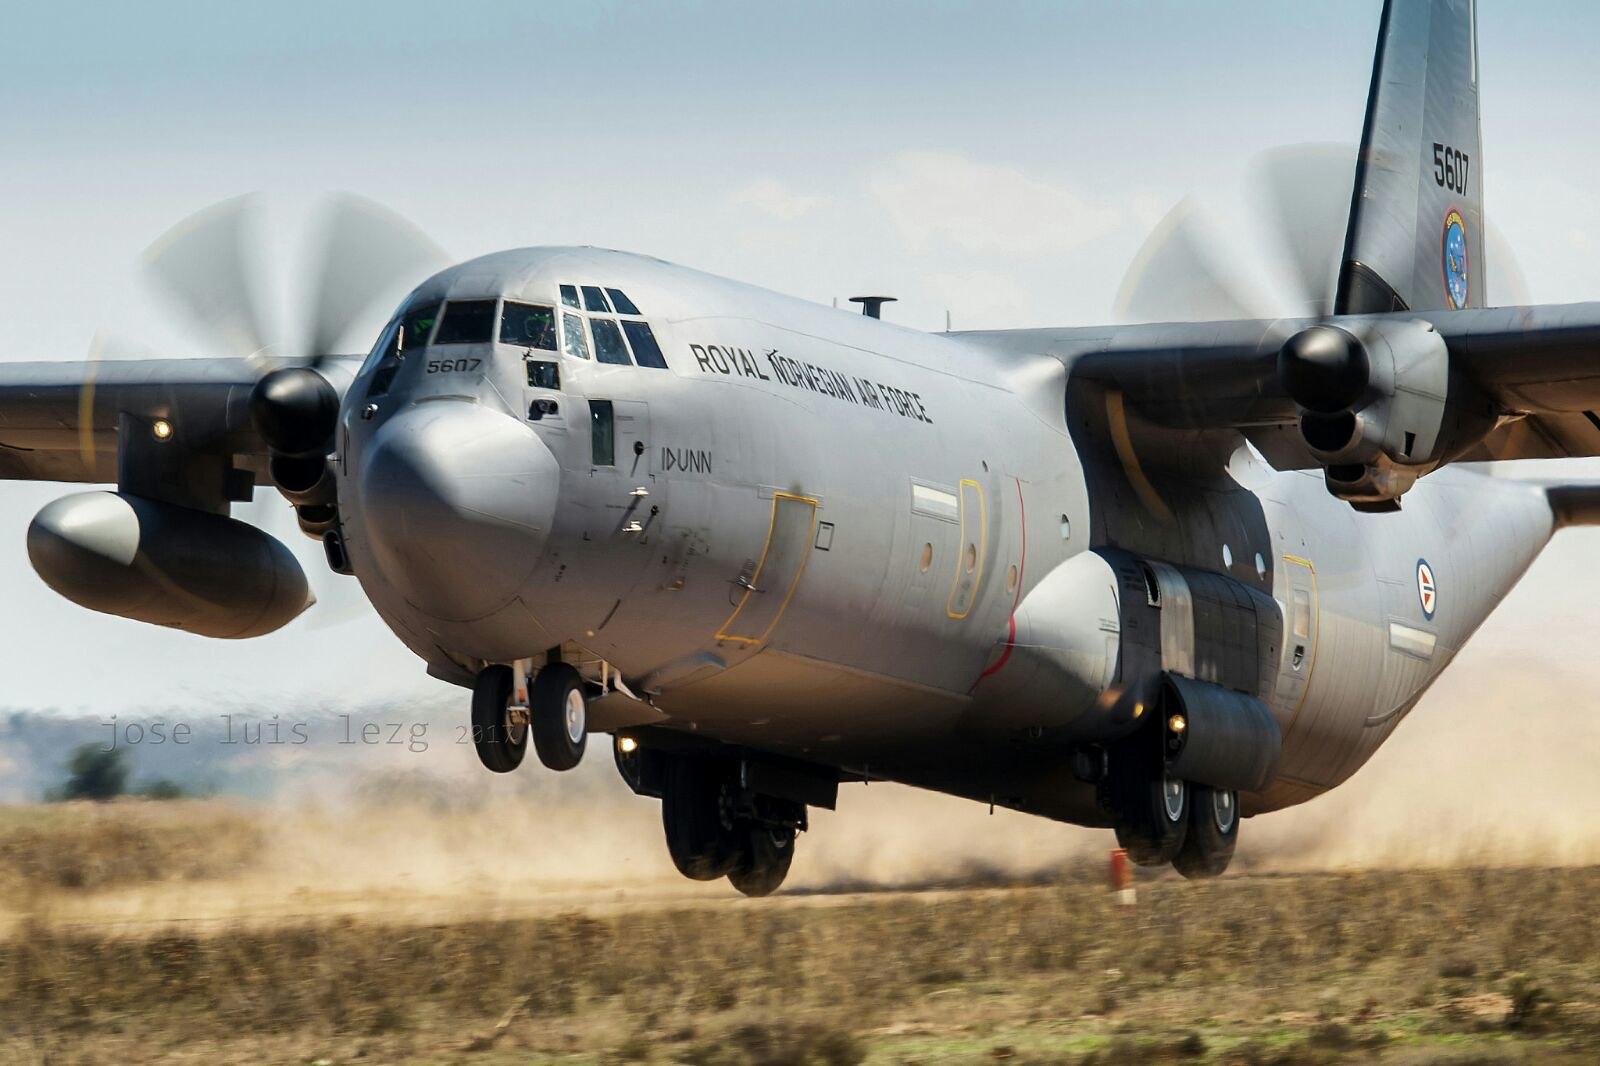 Hércules de la Fuerza Aérea de Noruega